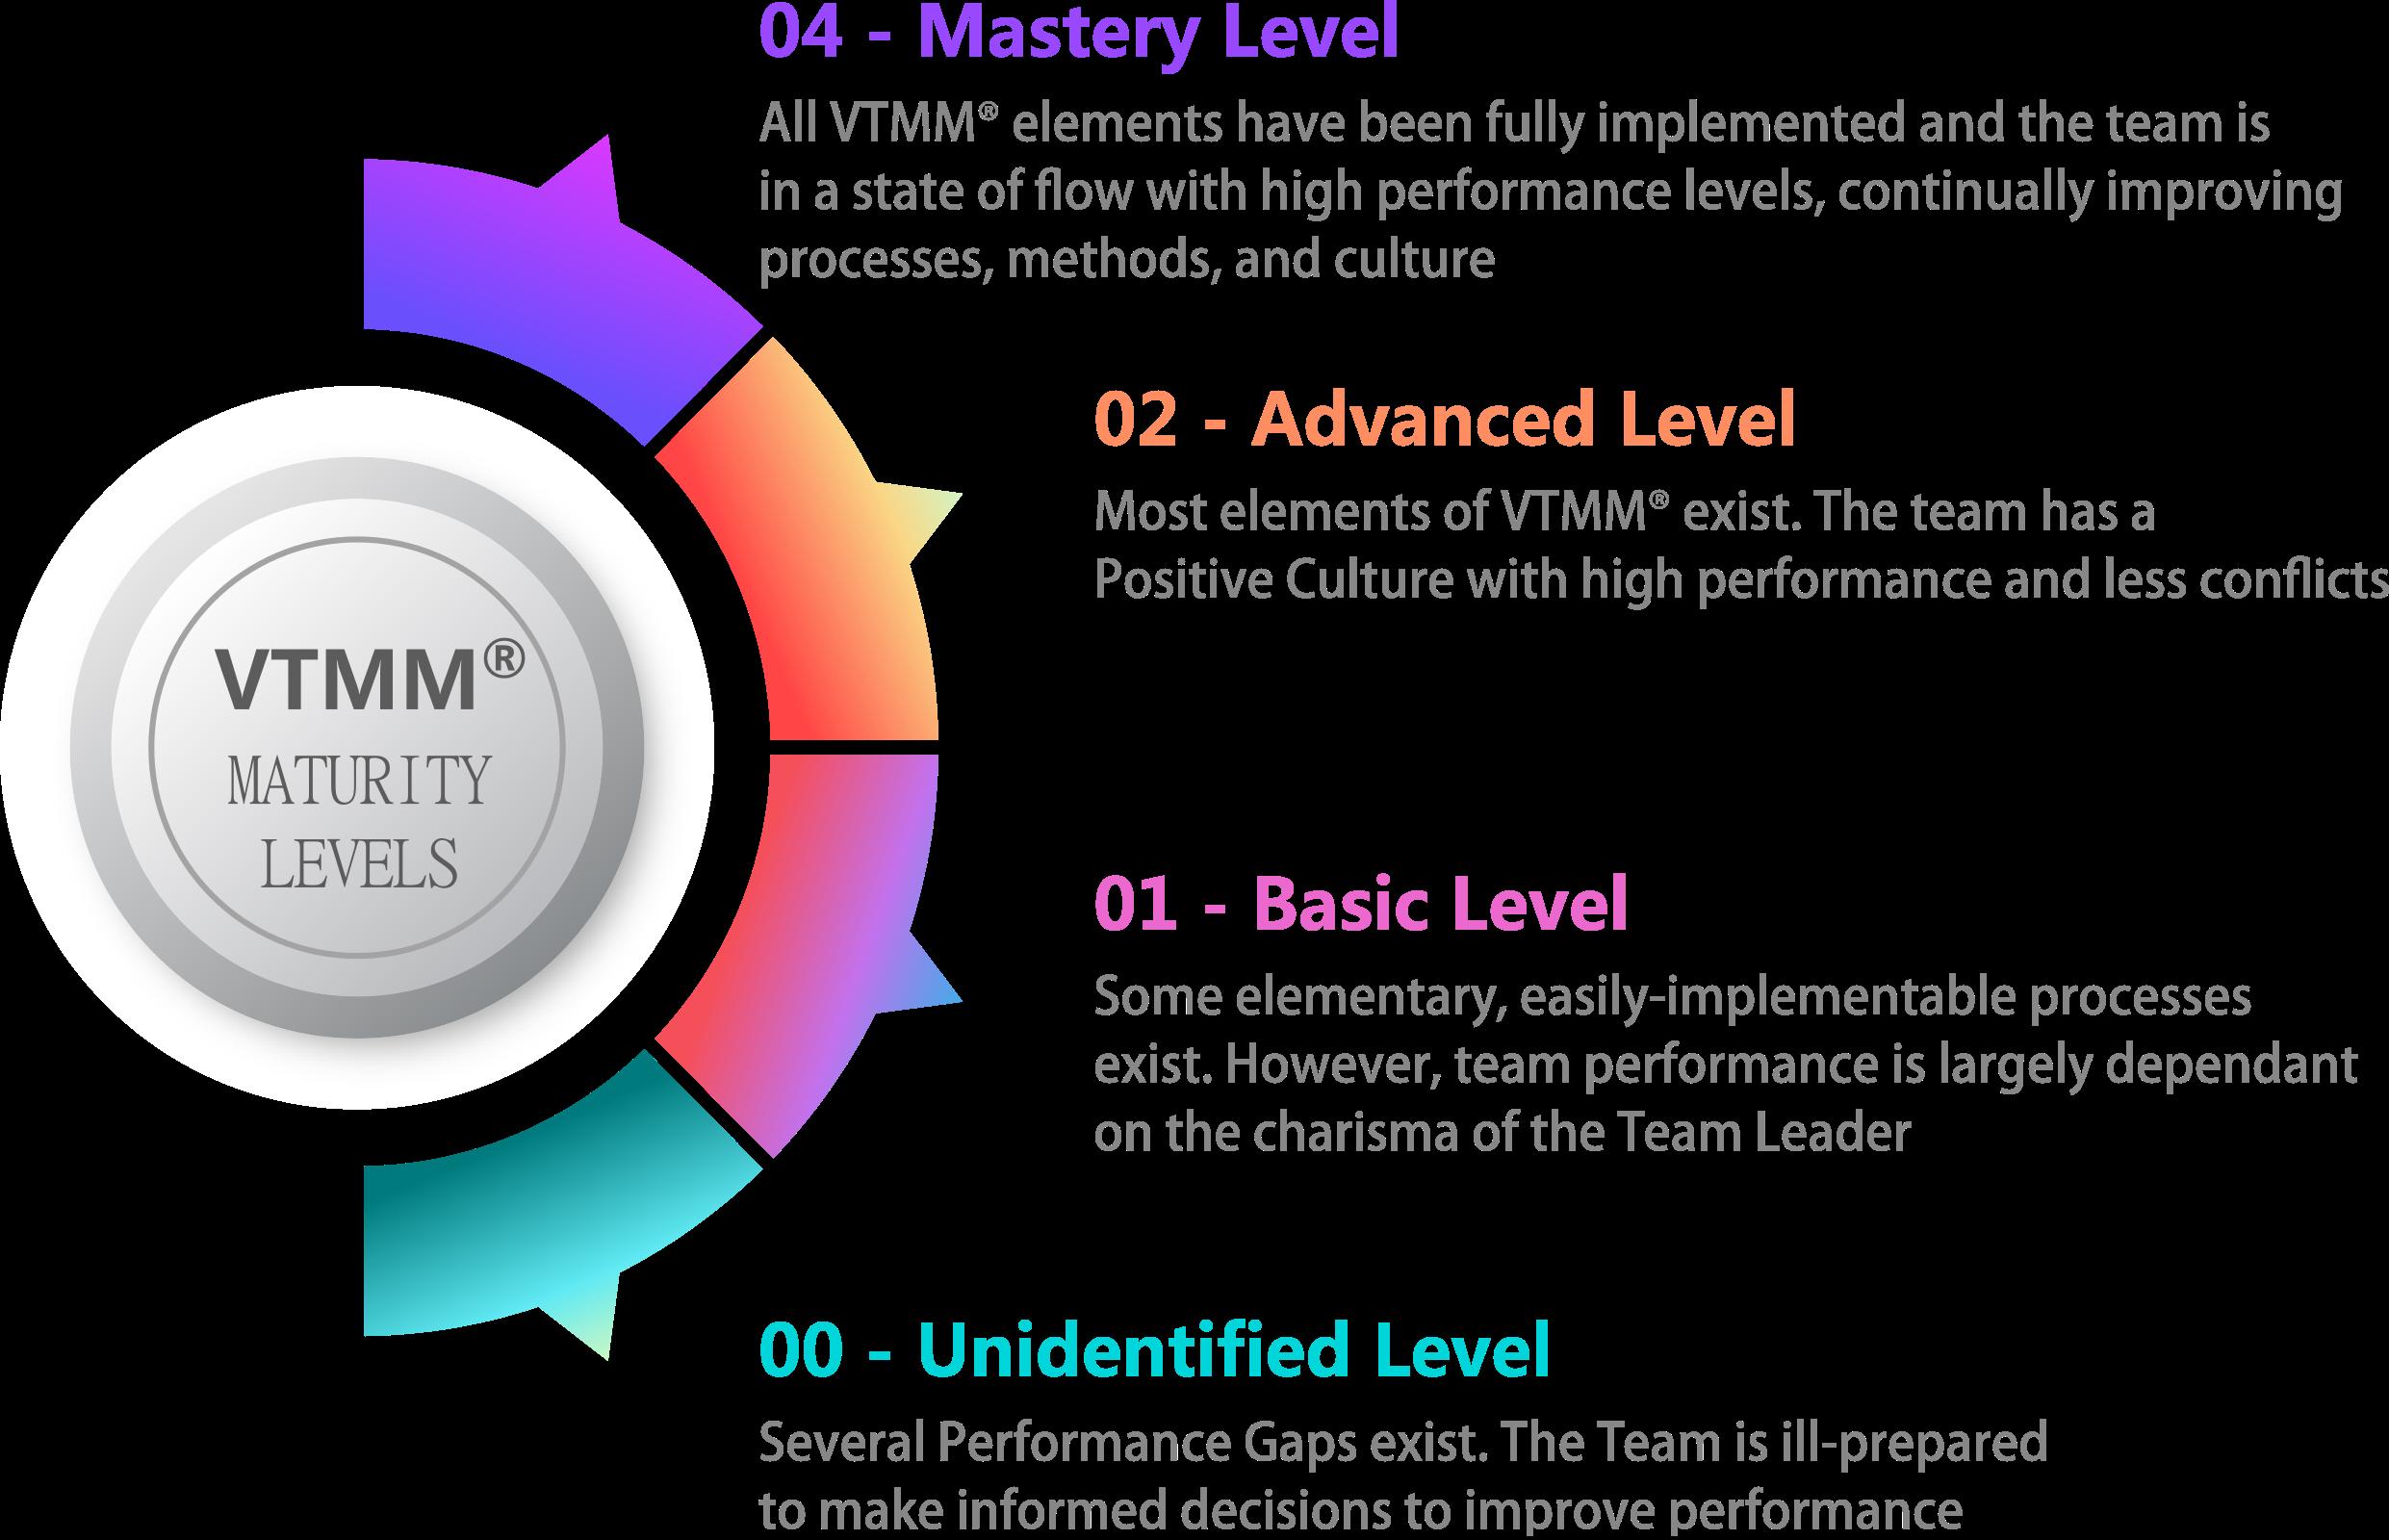 VTMM Maturity Levels